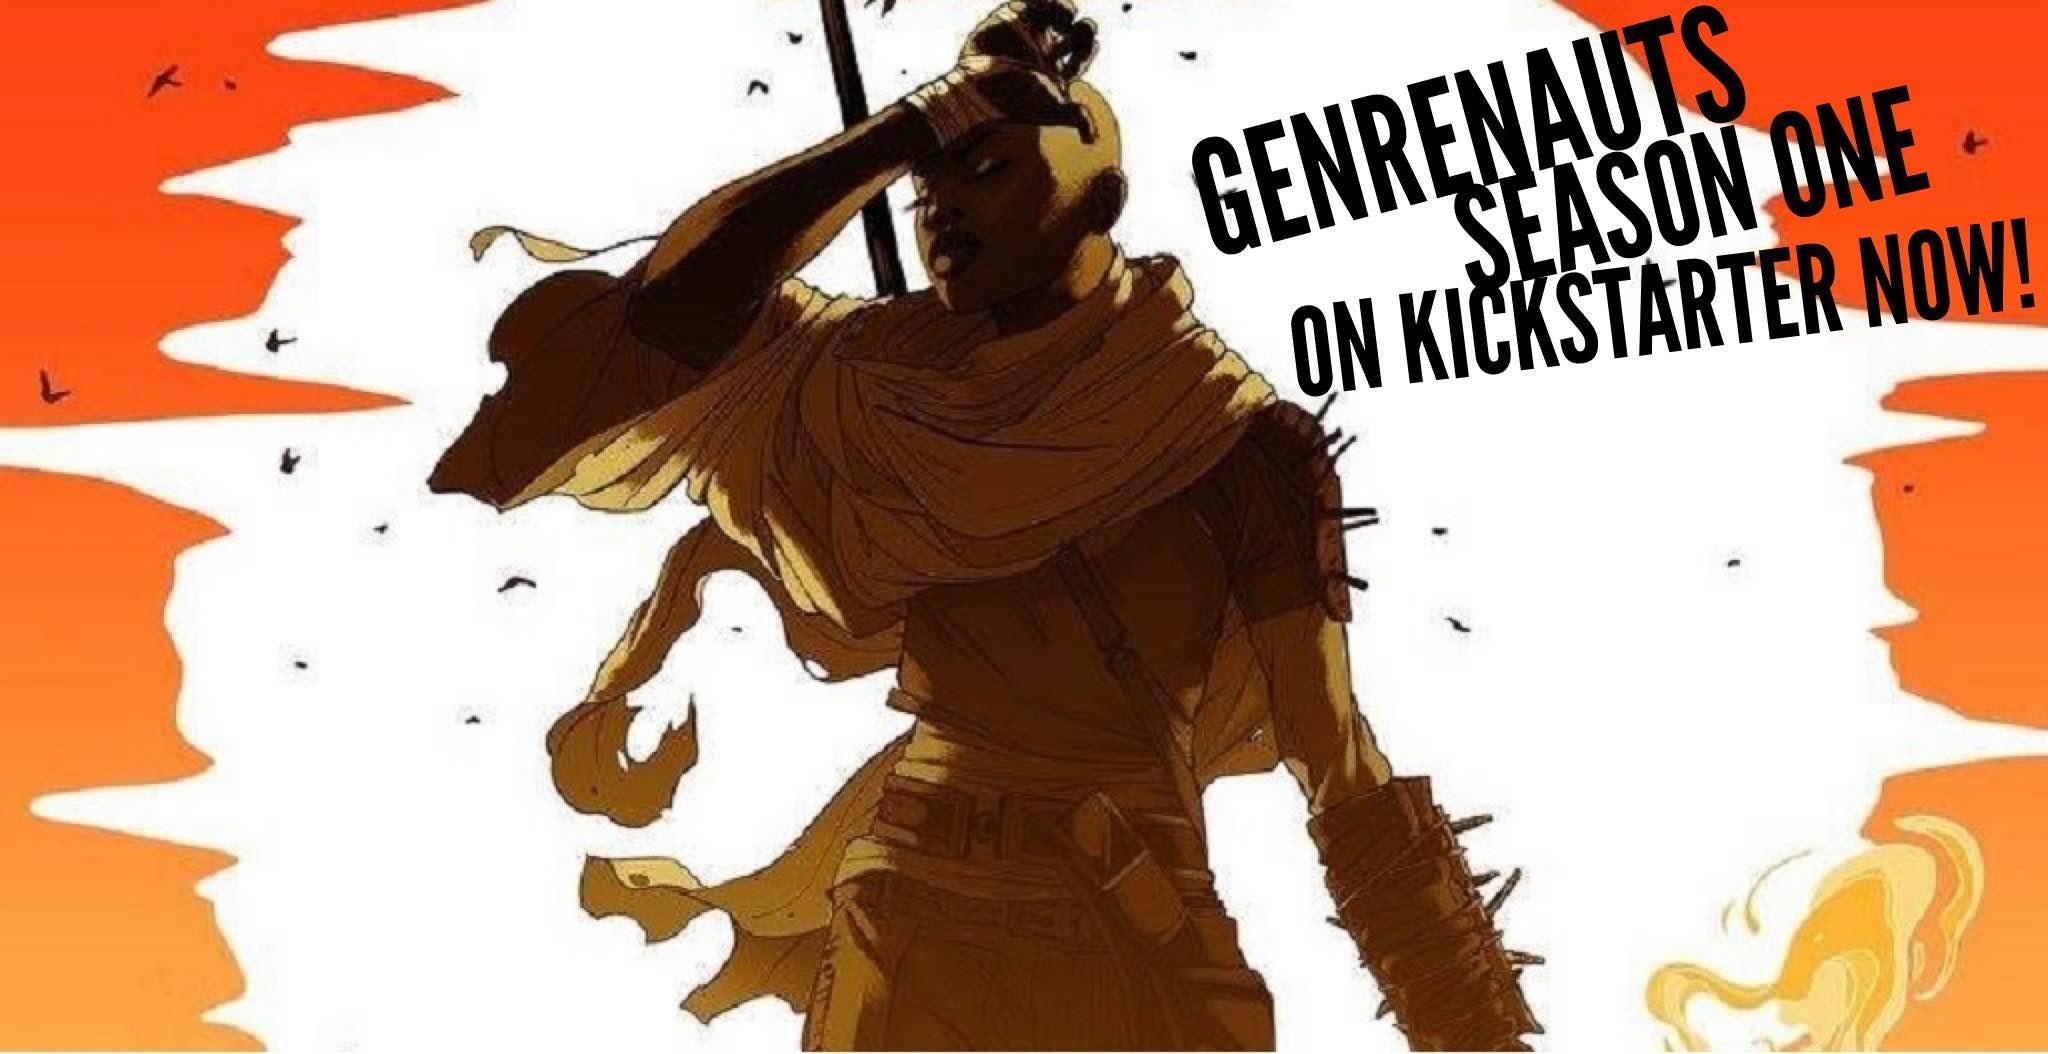 Genrenauts Twitter Card #3